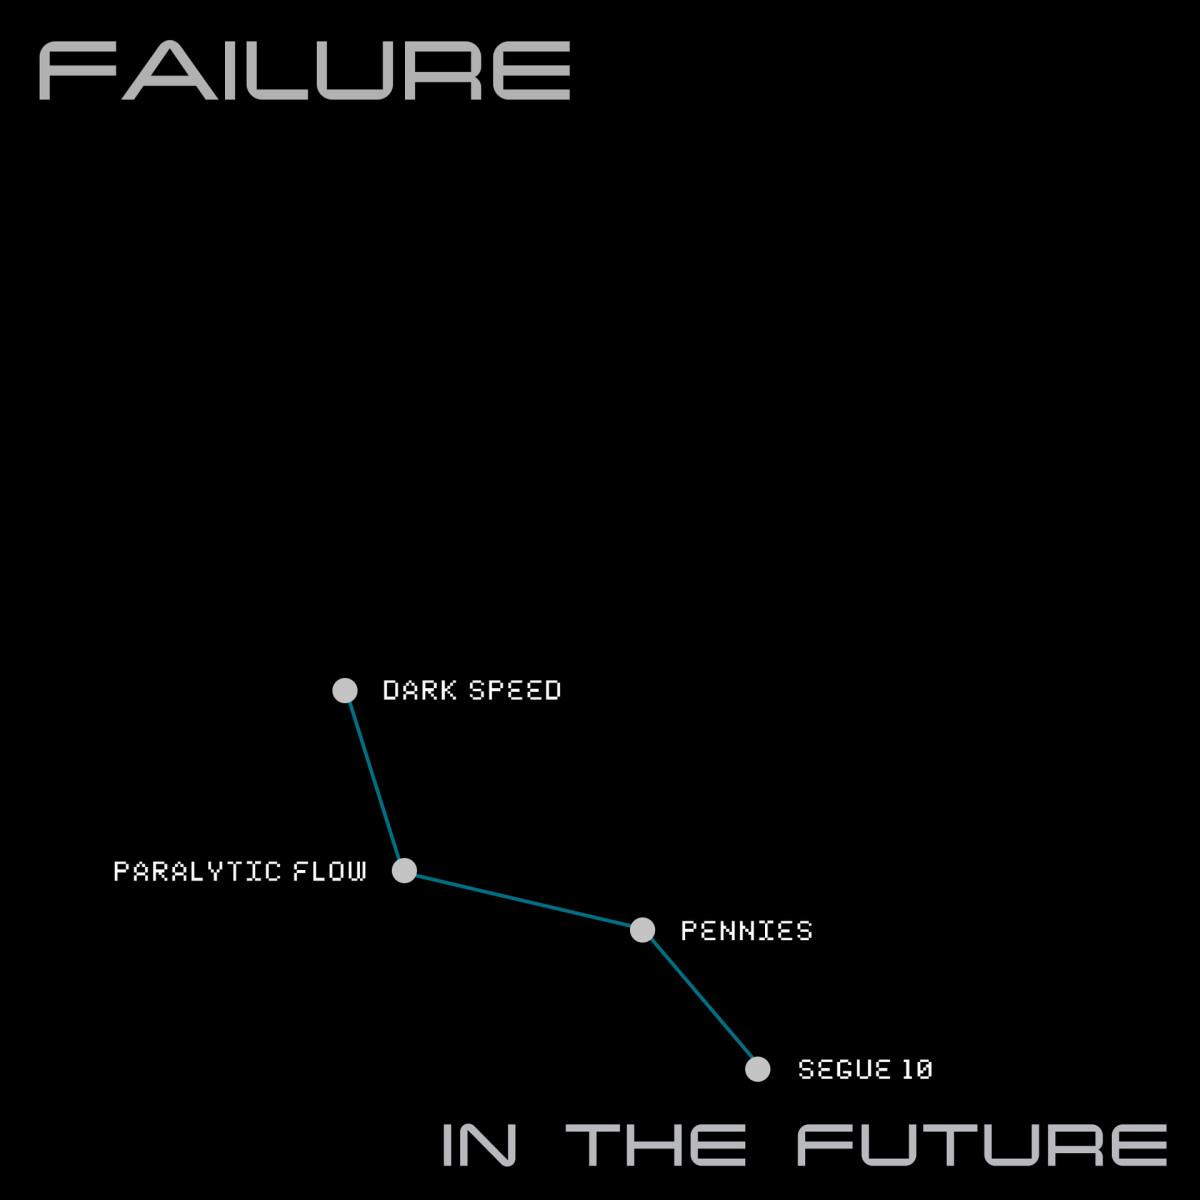 Failure new EP in the Future